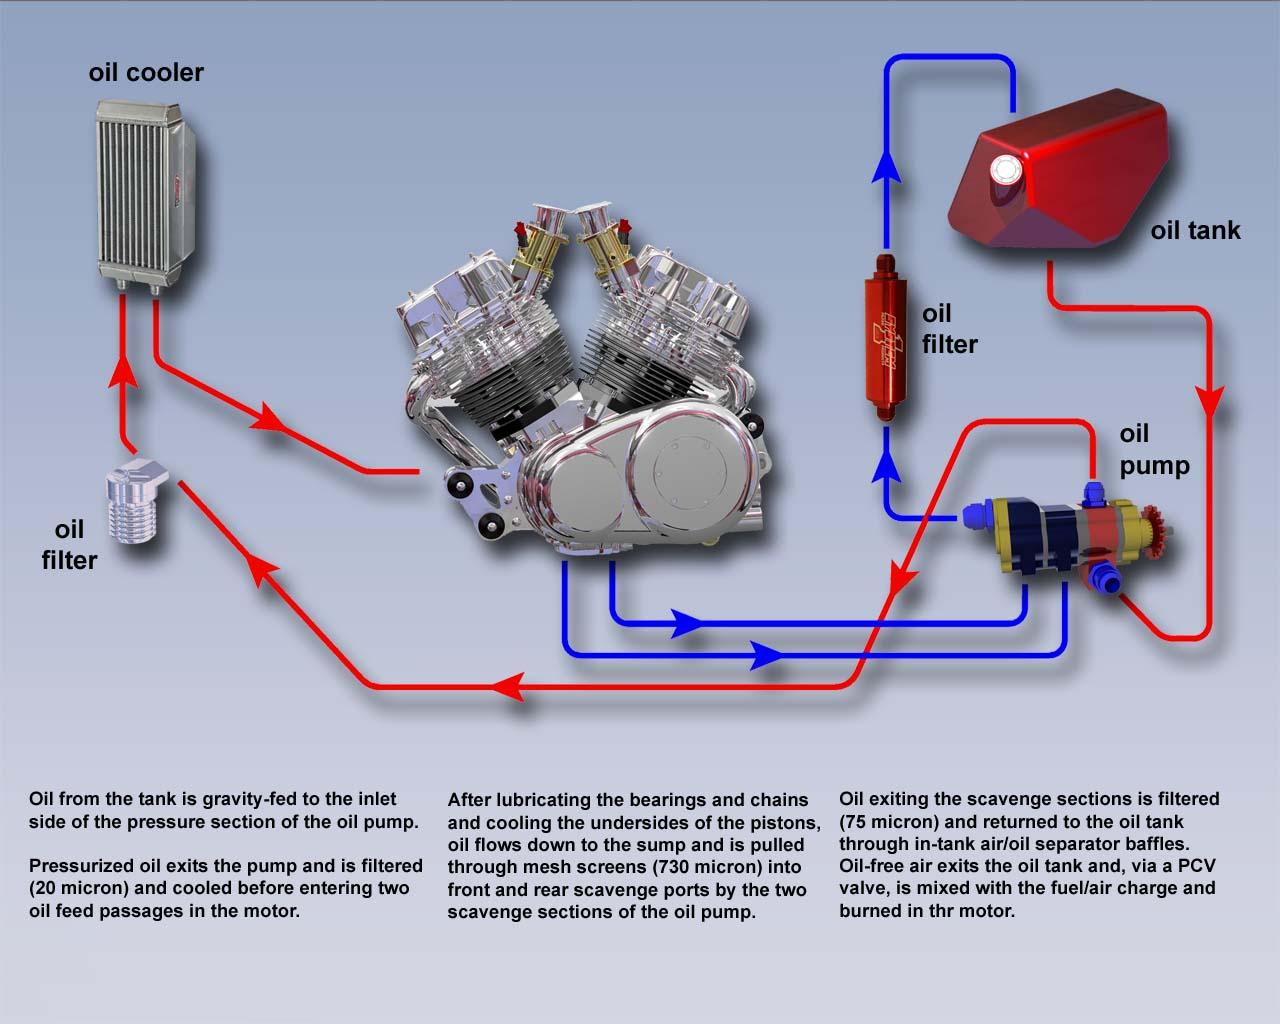 Trane Wiring Schematic Trane Chiller Model Number Nomenclature - Trane wiring diagrams hvac